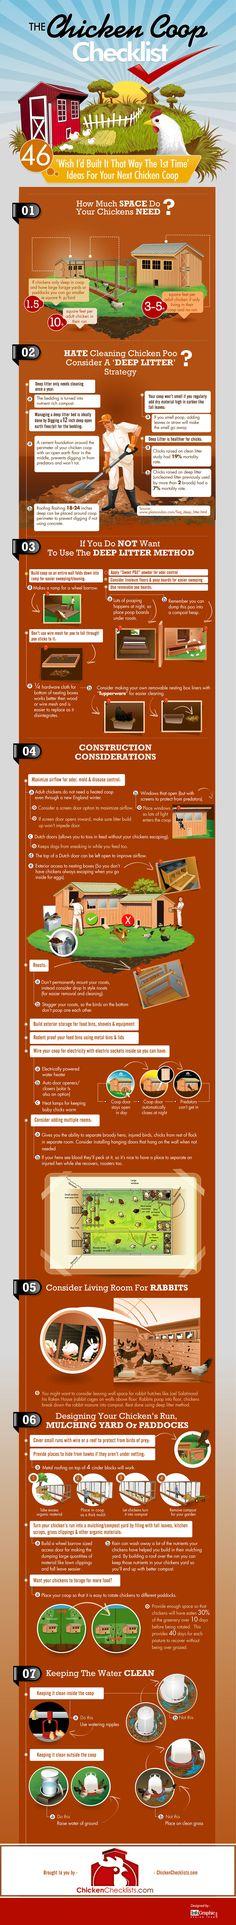 Chicken Coop Checklist @ Momwithaprep.com via @momwithaprep